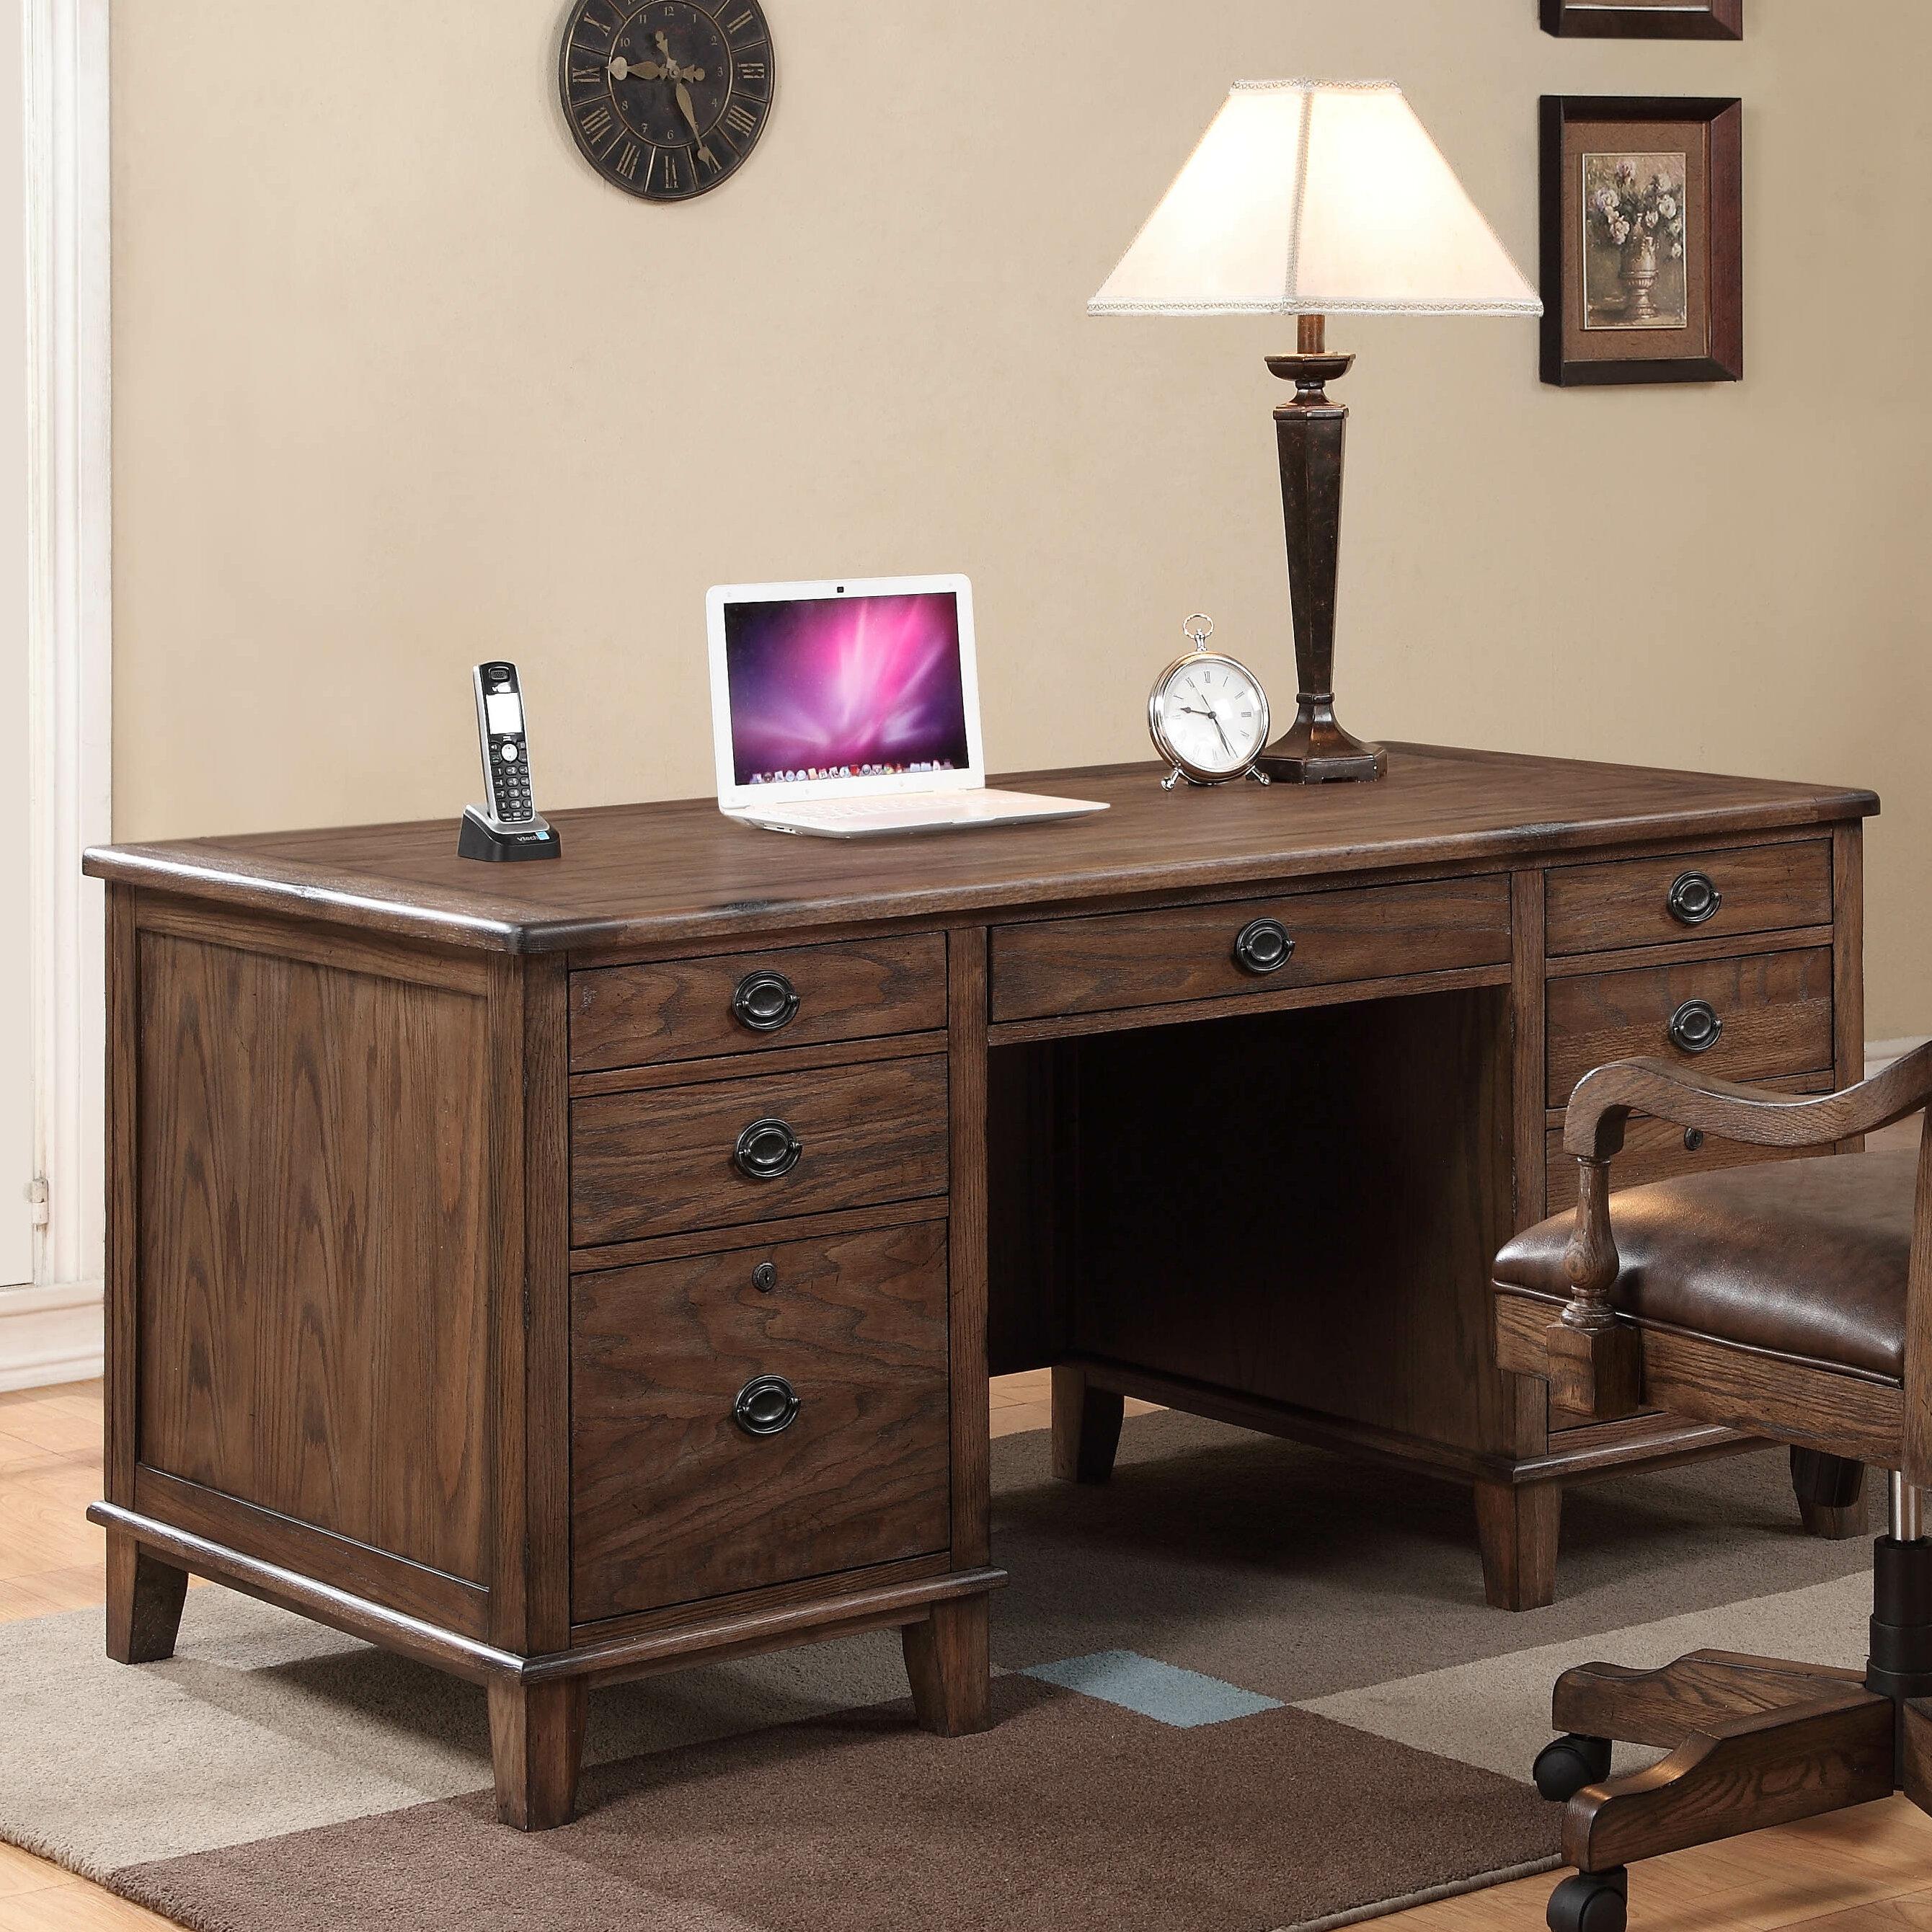 Harrison Flats Solid Wood Executive Desk